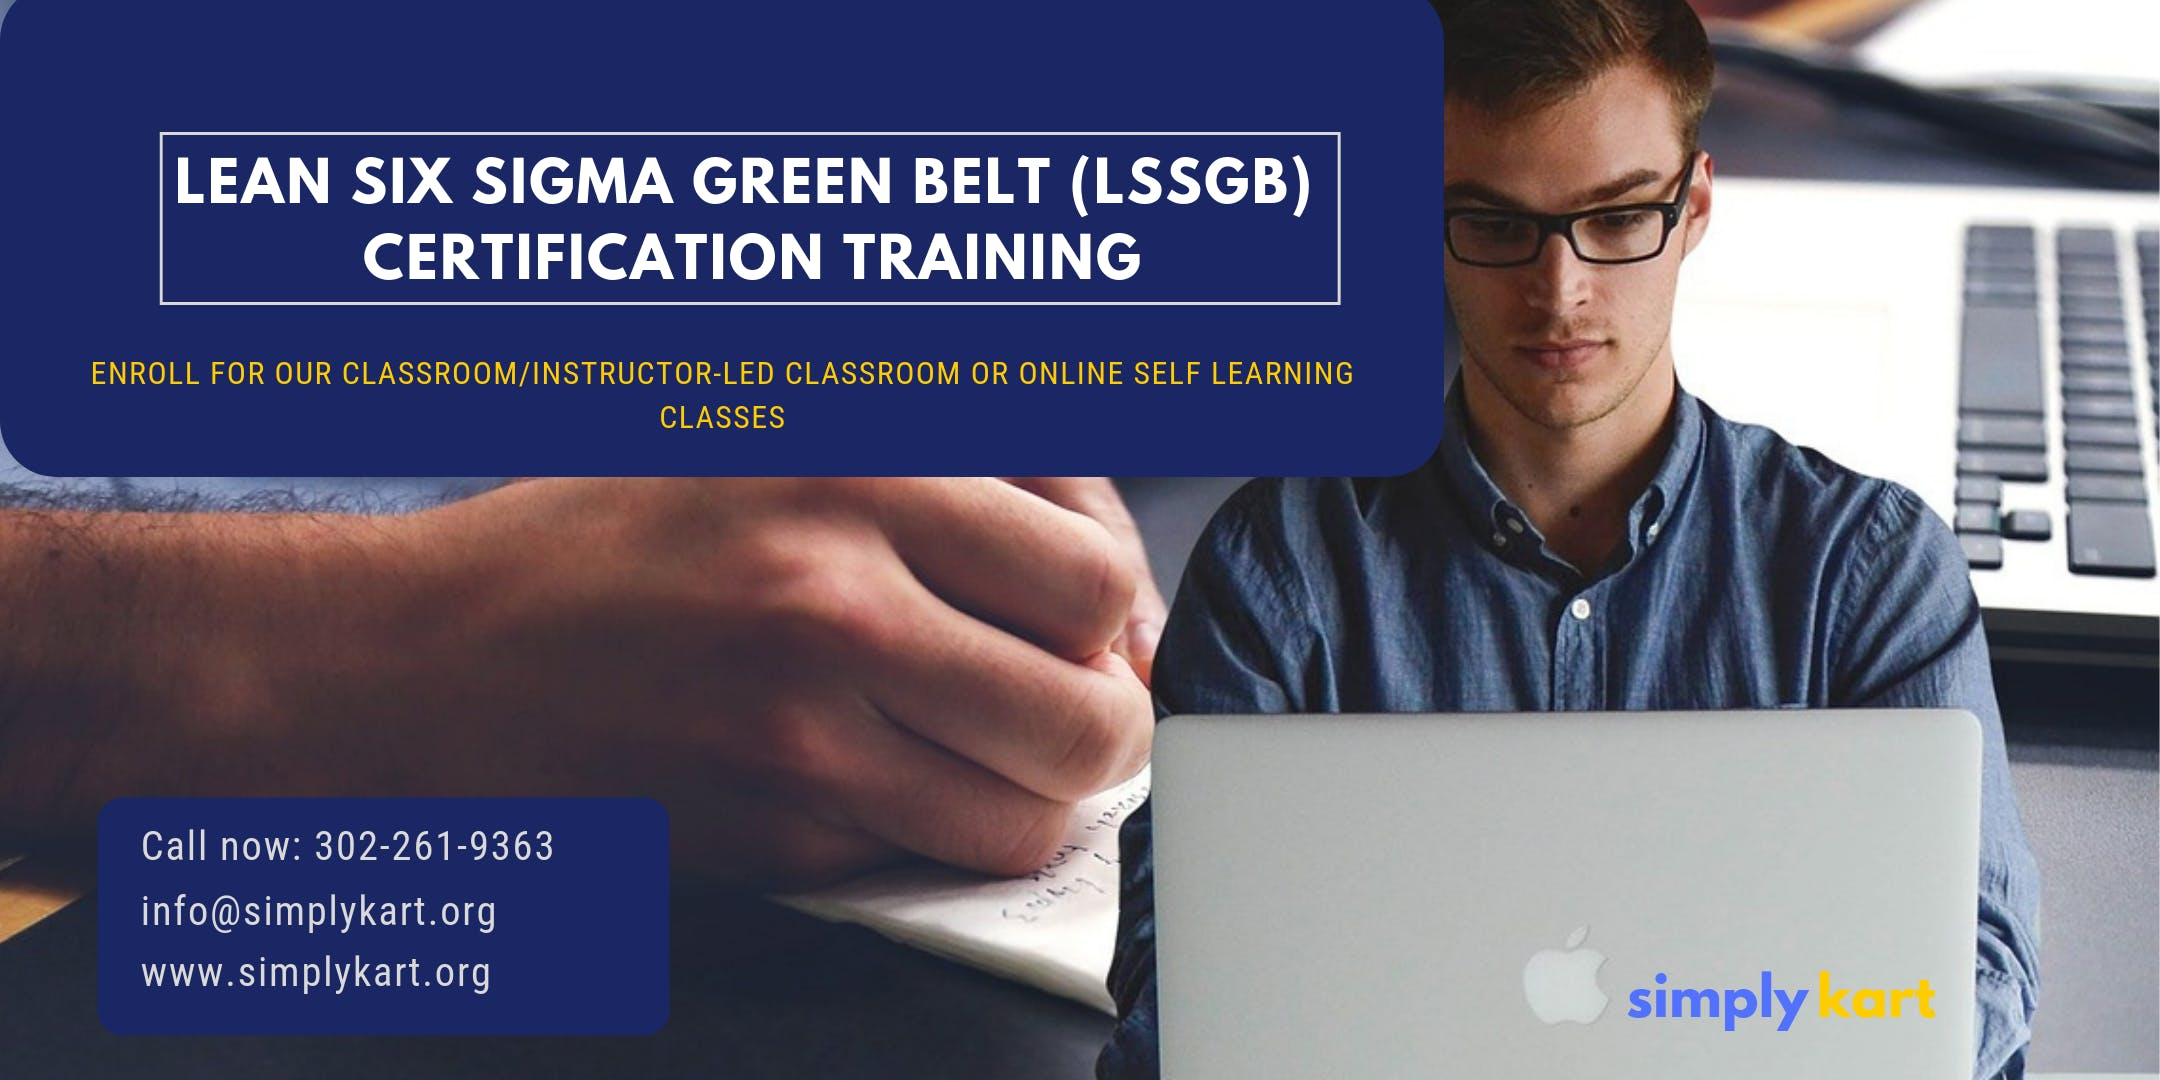 Lean Six Sigma Green Belt (LSSGB) Certification Training in Laval, PE